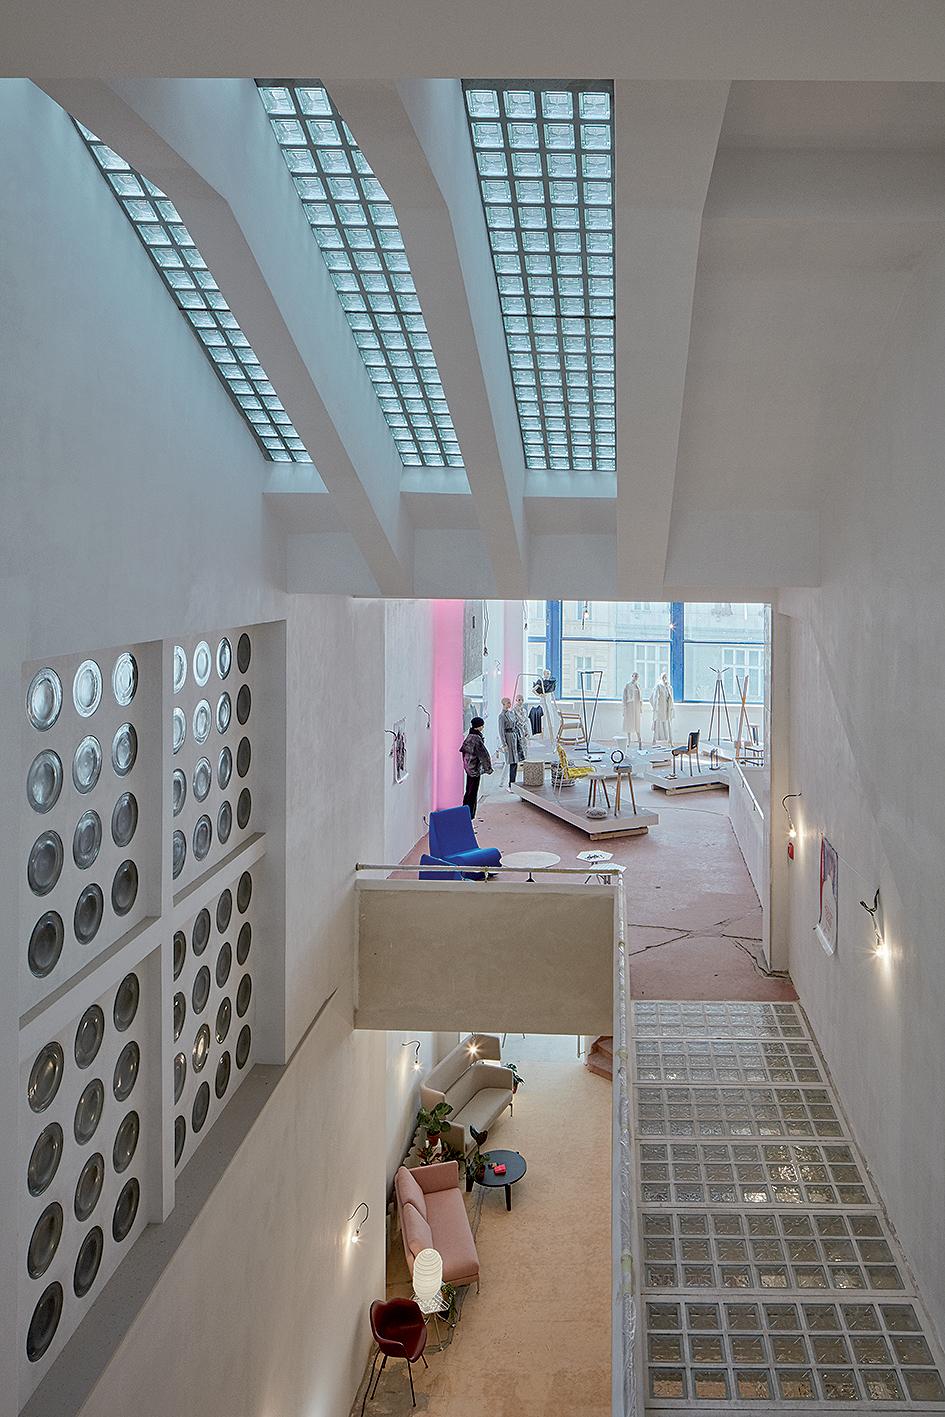 ešení úzké parcely po vzoru Le Corbusiera